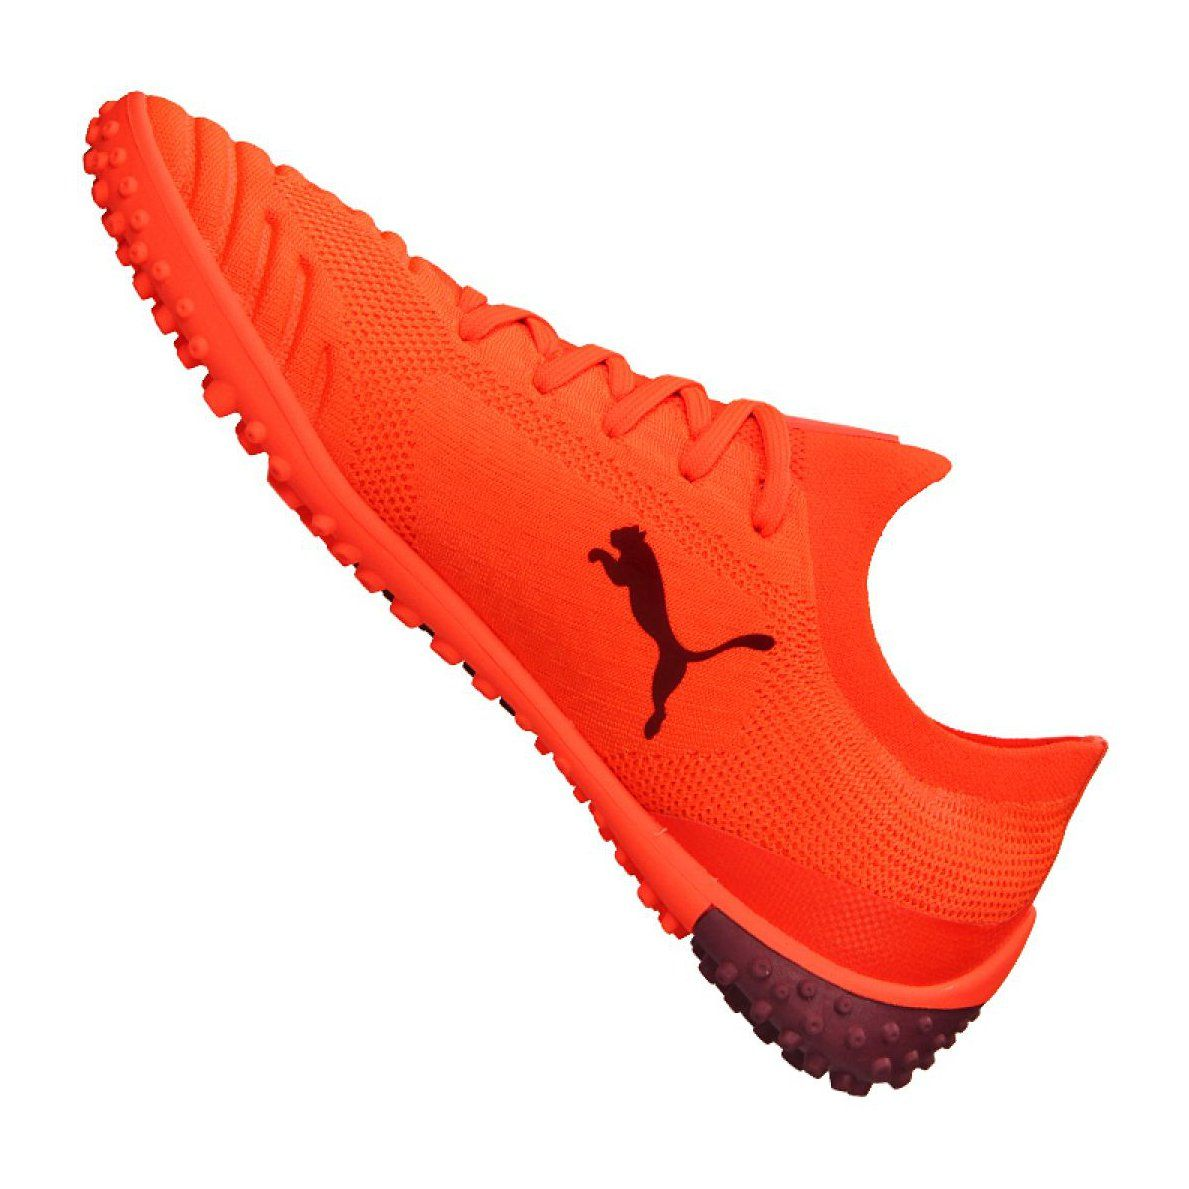 Buty Pilkarskie Puma 365 Concrete 1 St M 105752 02 Pomaranczowe Pomaranczowe Football Boots Football Shoes Puma